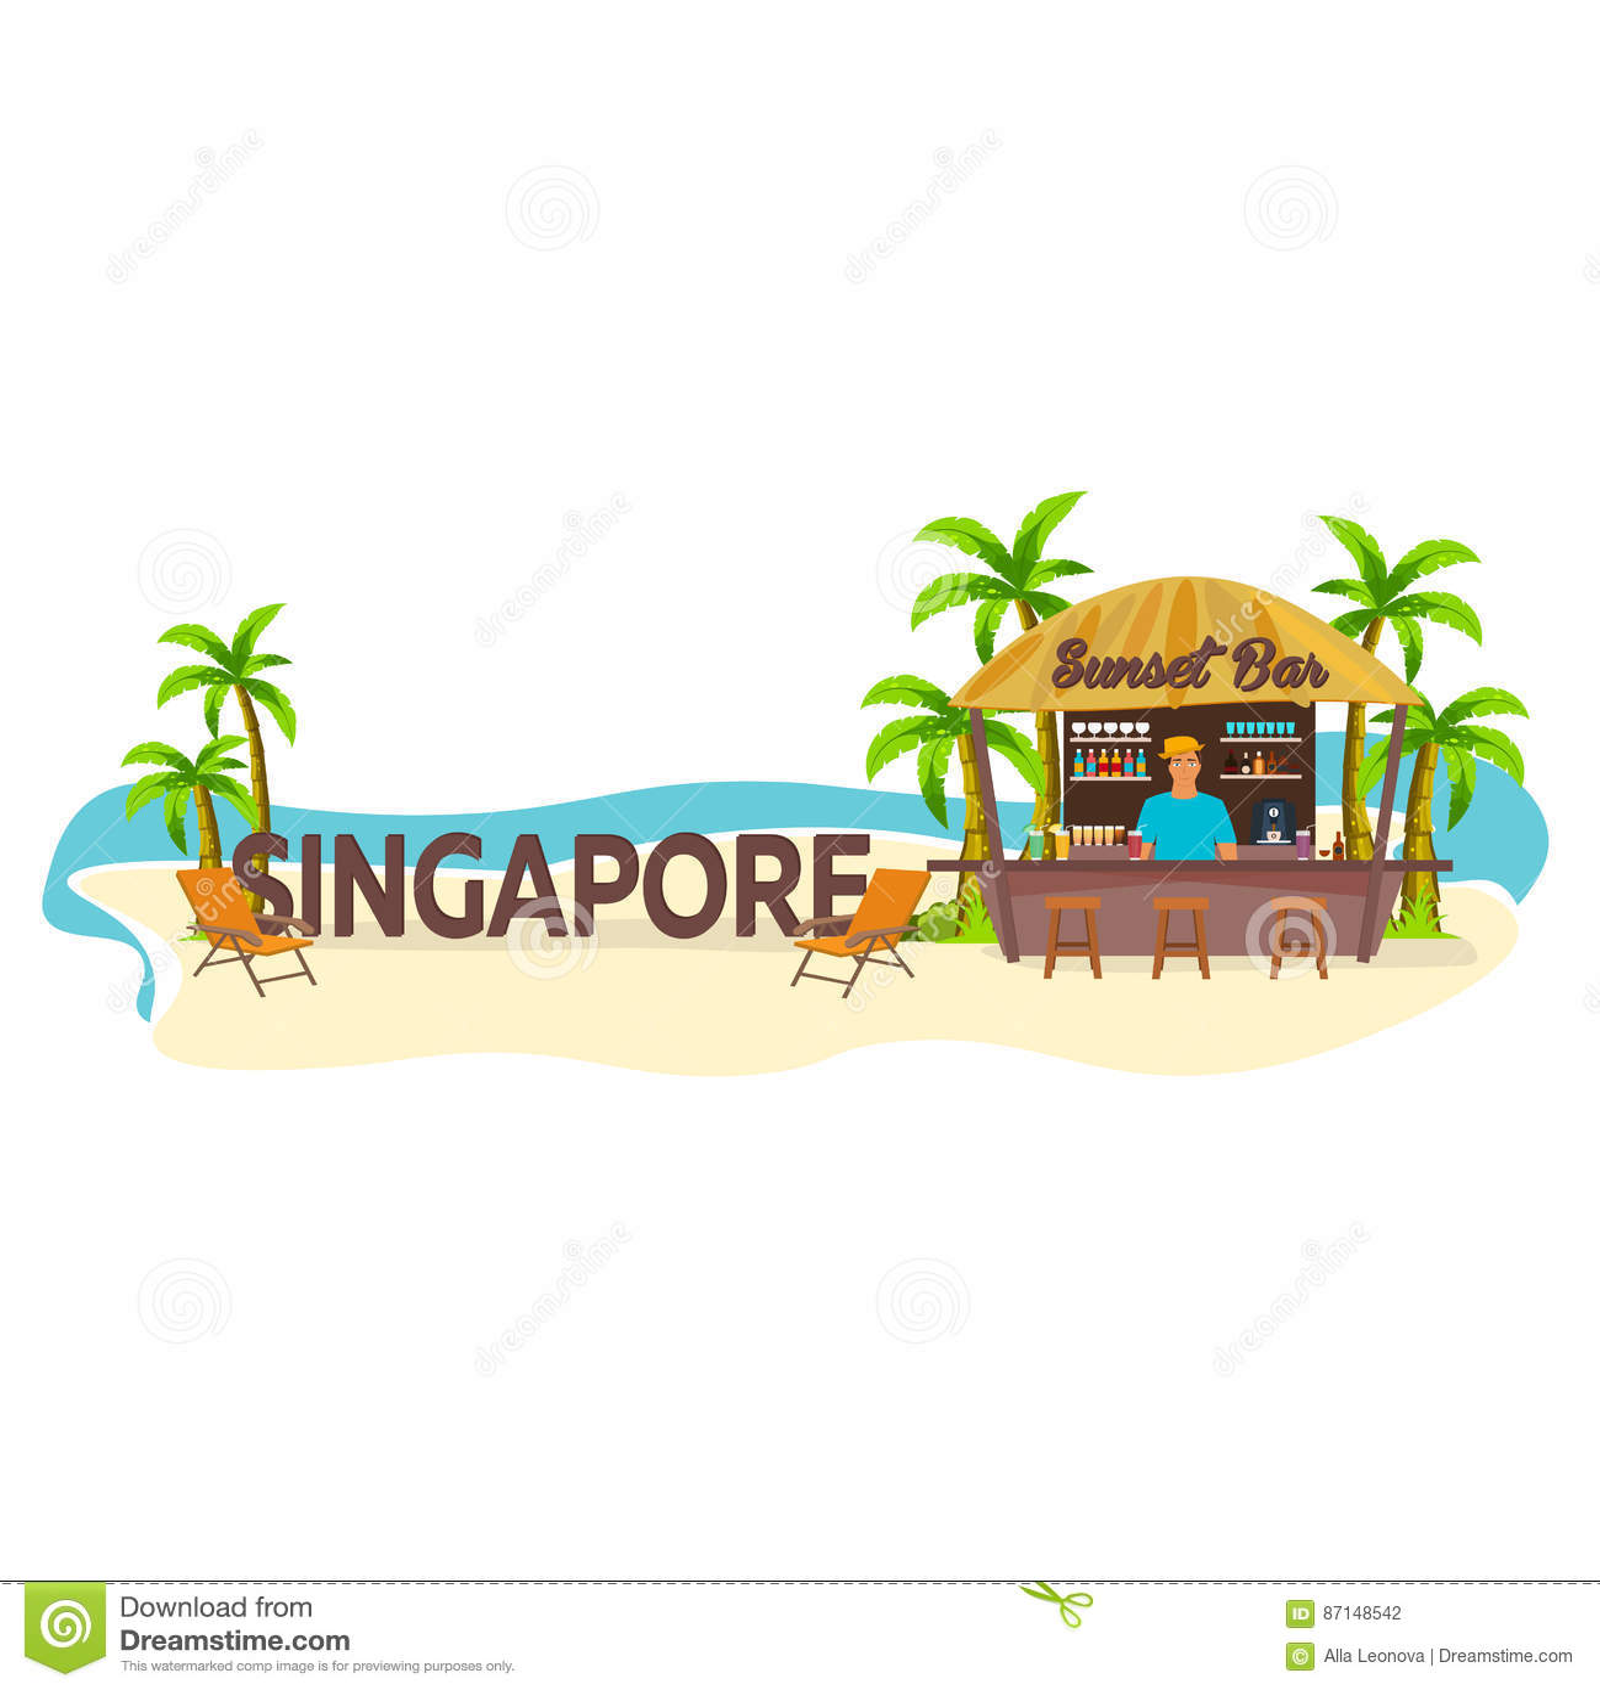 Singapur Viajes Palma, bebida, verano, sillón, tropical